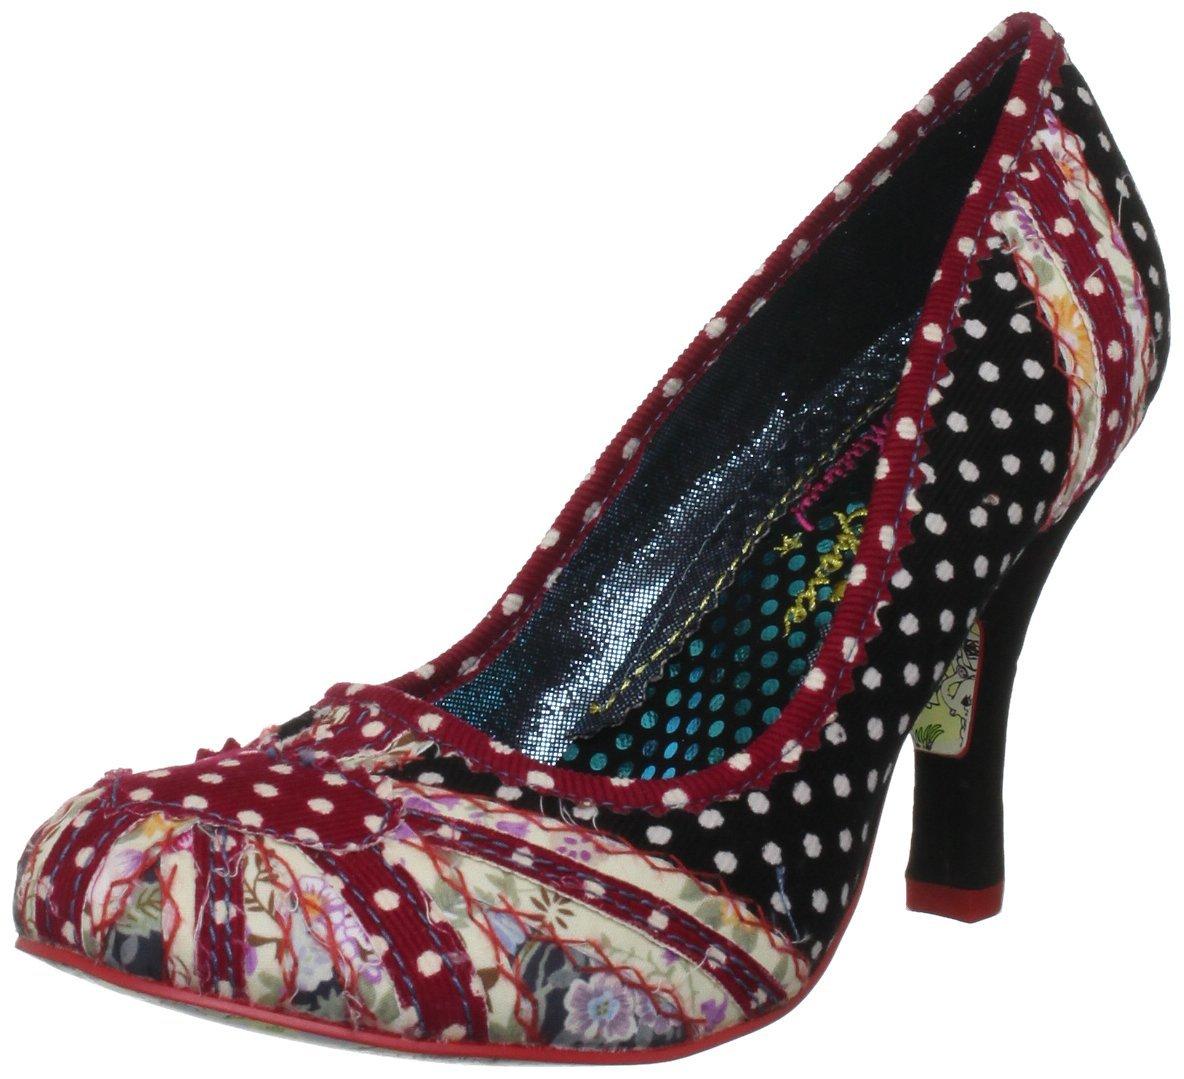 Patty Black amp Red Shoe Irregular Choice